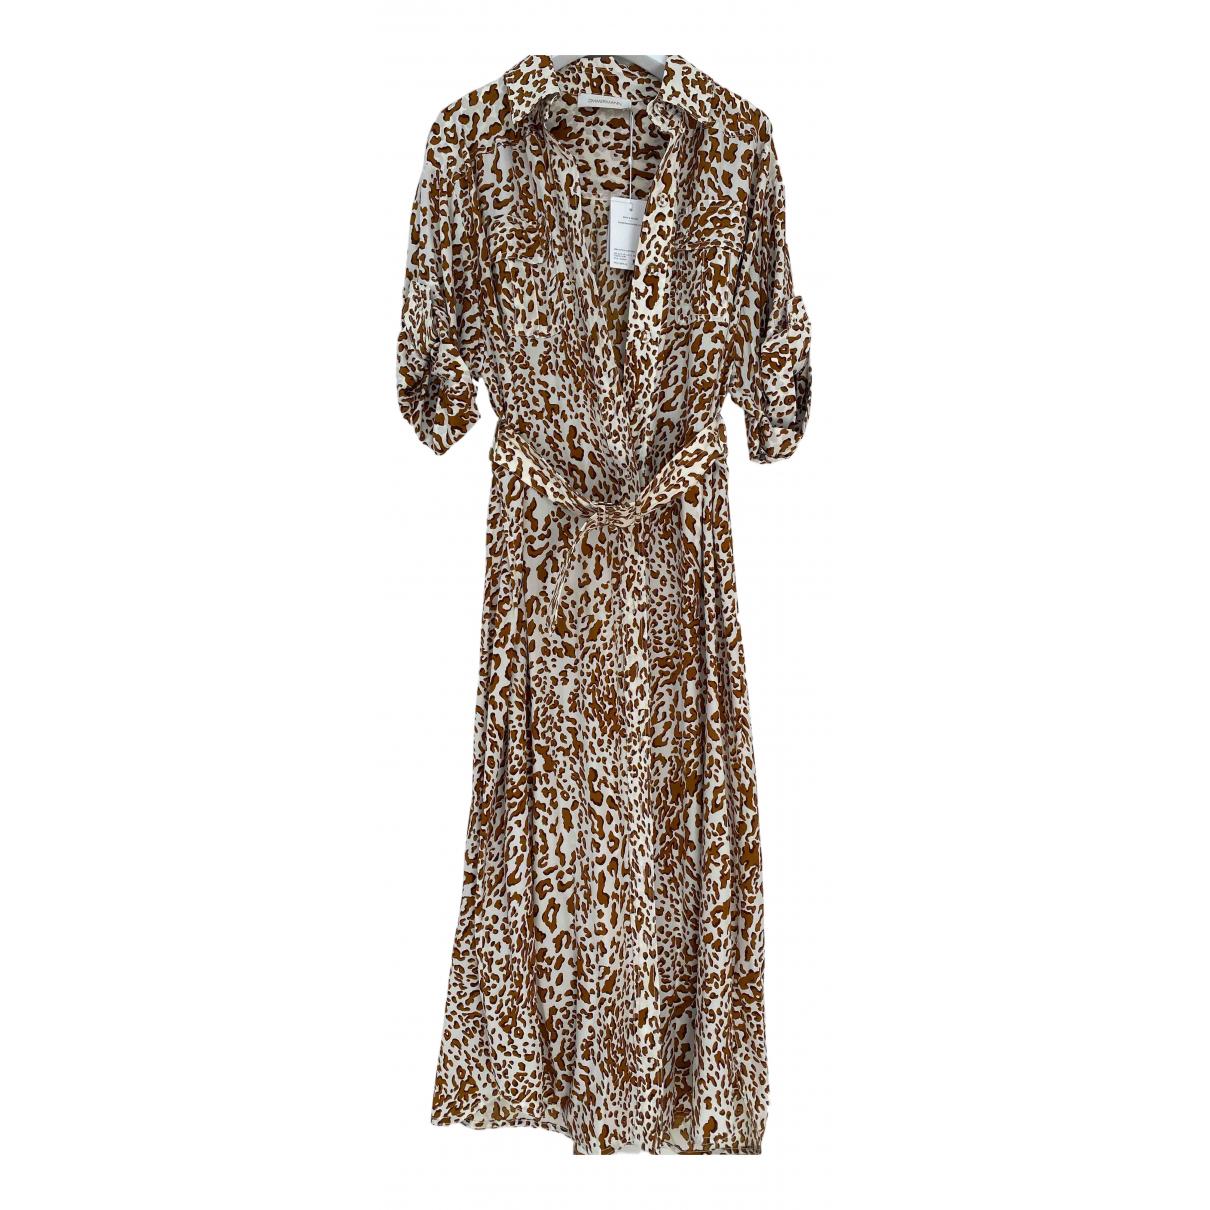 Zimmermann N Brown Silk dress for Women 12 UK